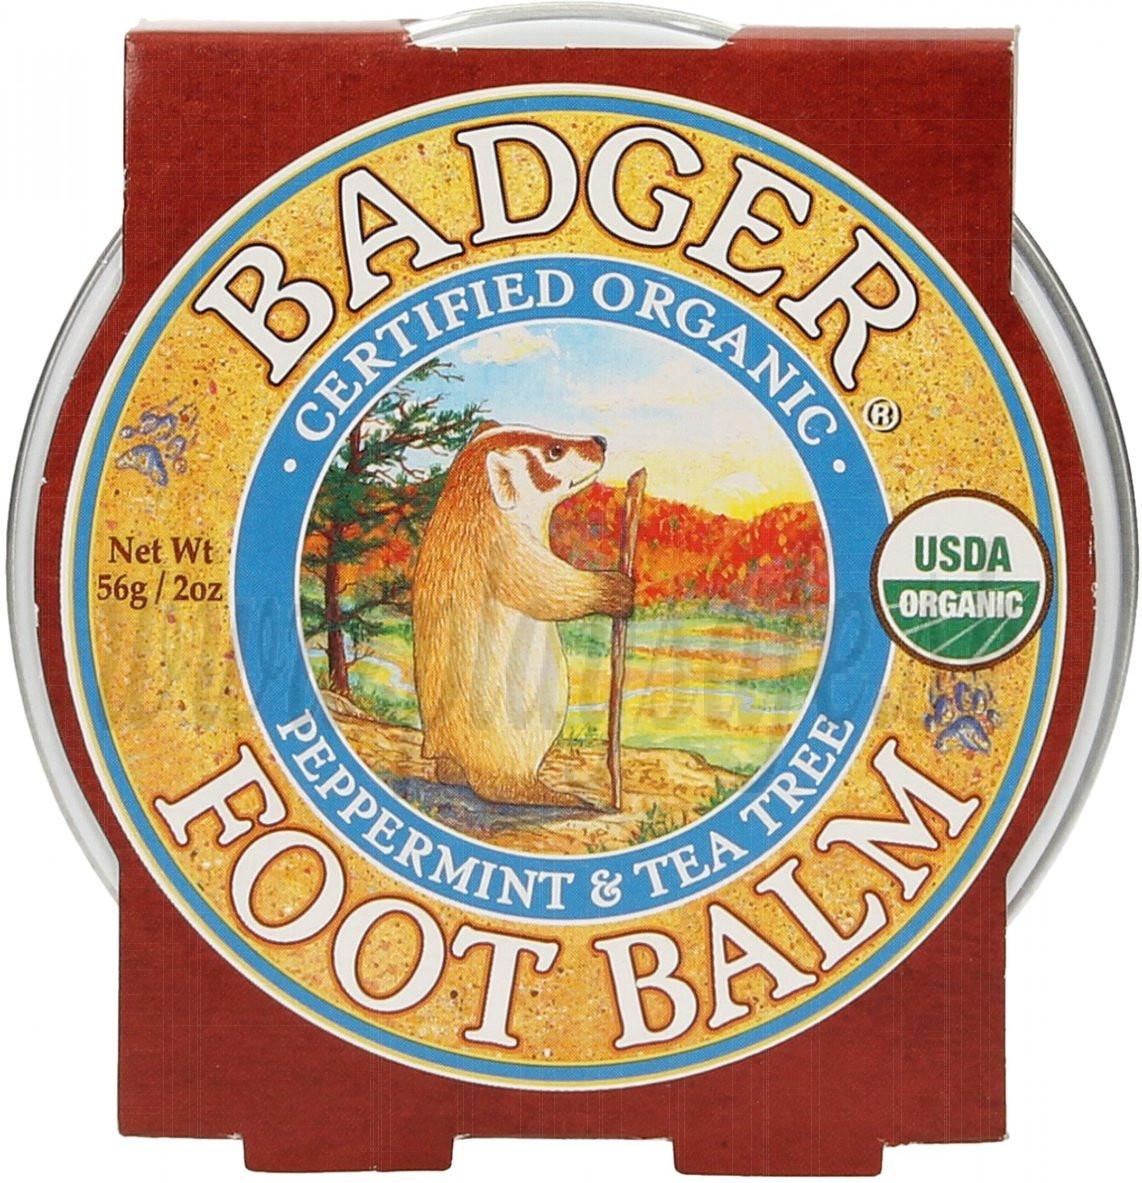 Badger Balm Foot Balm, 56g